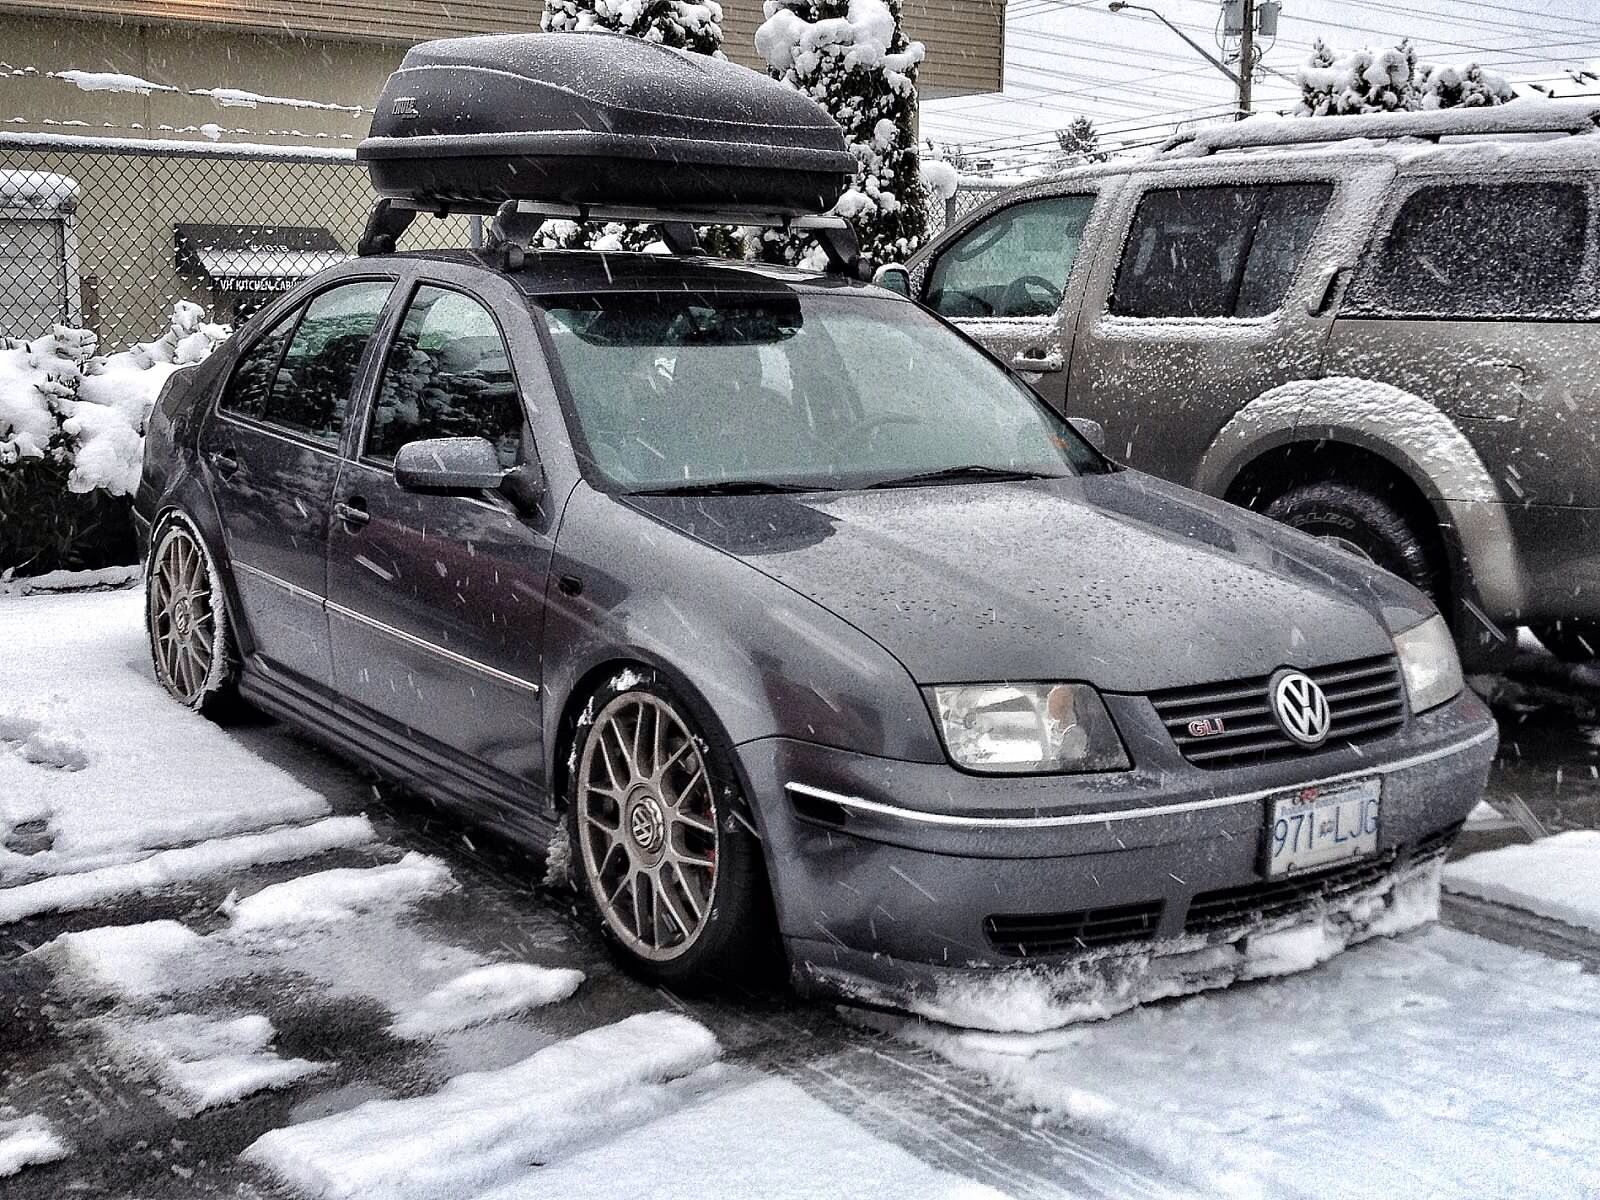 Slammed Mk4 Jetta Gli Snowplow Volkswagenjetta Volkswagen Jetta Volkswagen Vw Jetta Tdi